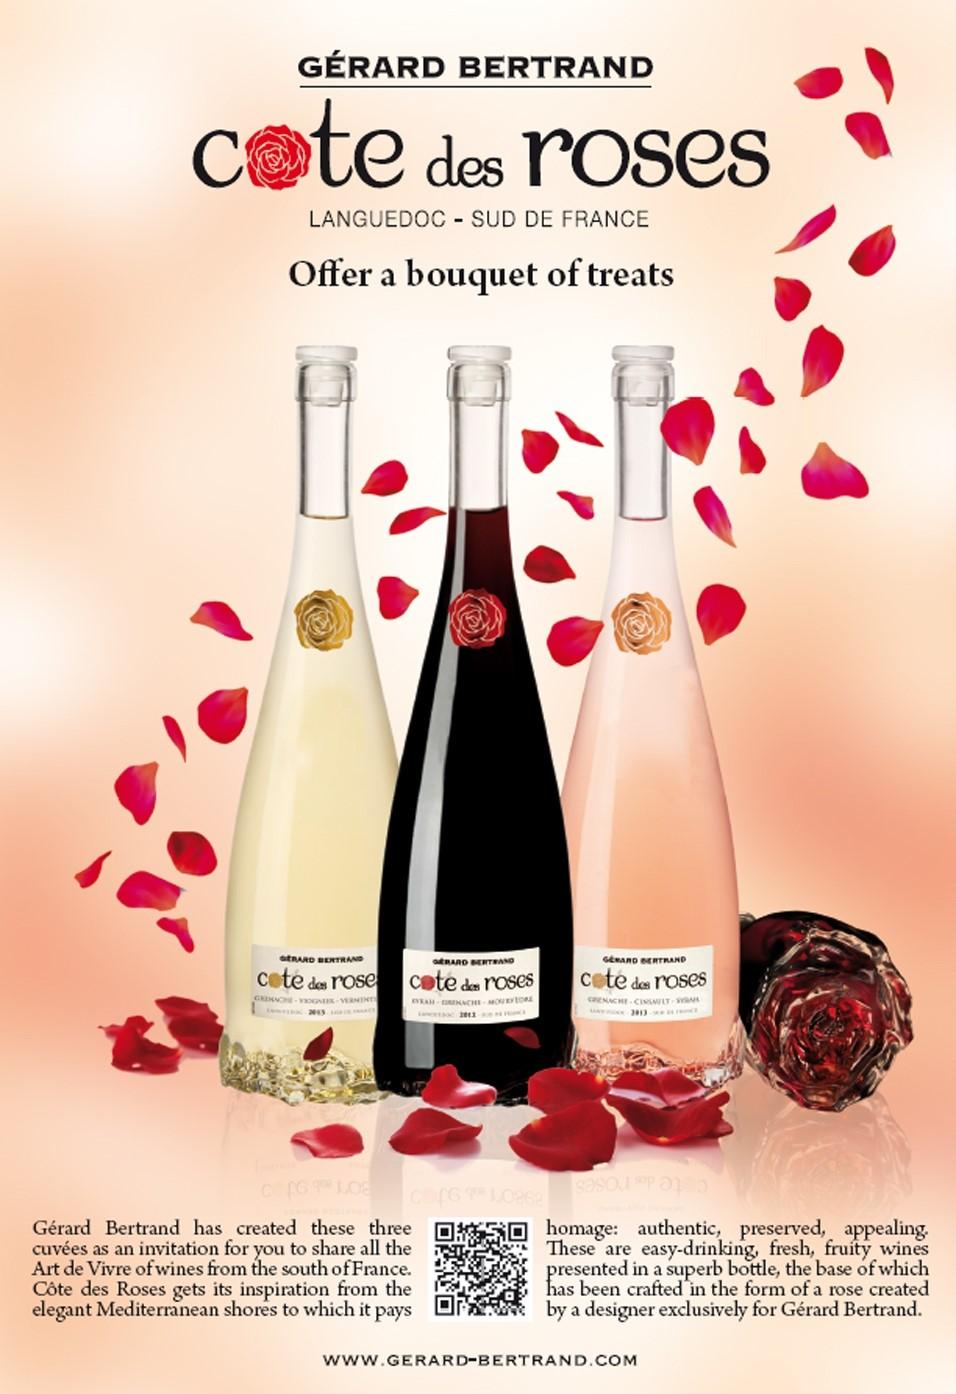 cote des rose wine pic